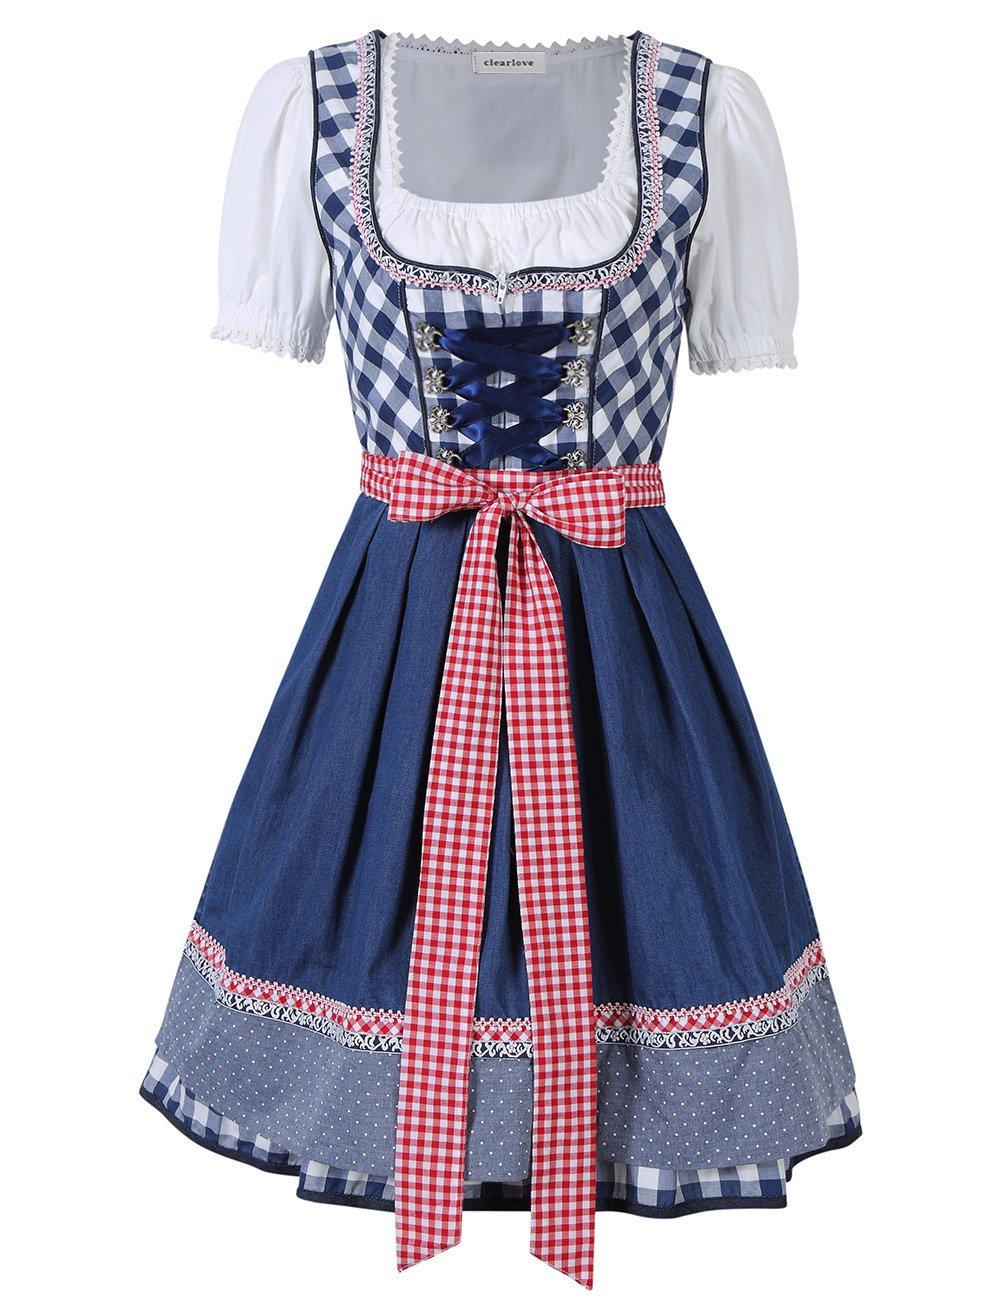 Leoie Clearlove Women's Oktoberfest Holiday Costumes Dresses Plaid Short Sleeve Triple Splicing Dress Suit Blue Plaid 40